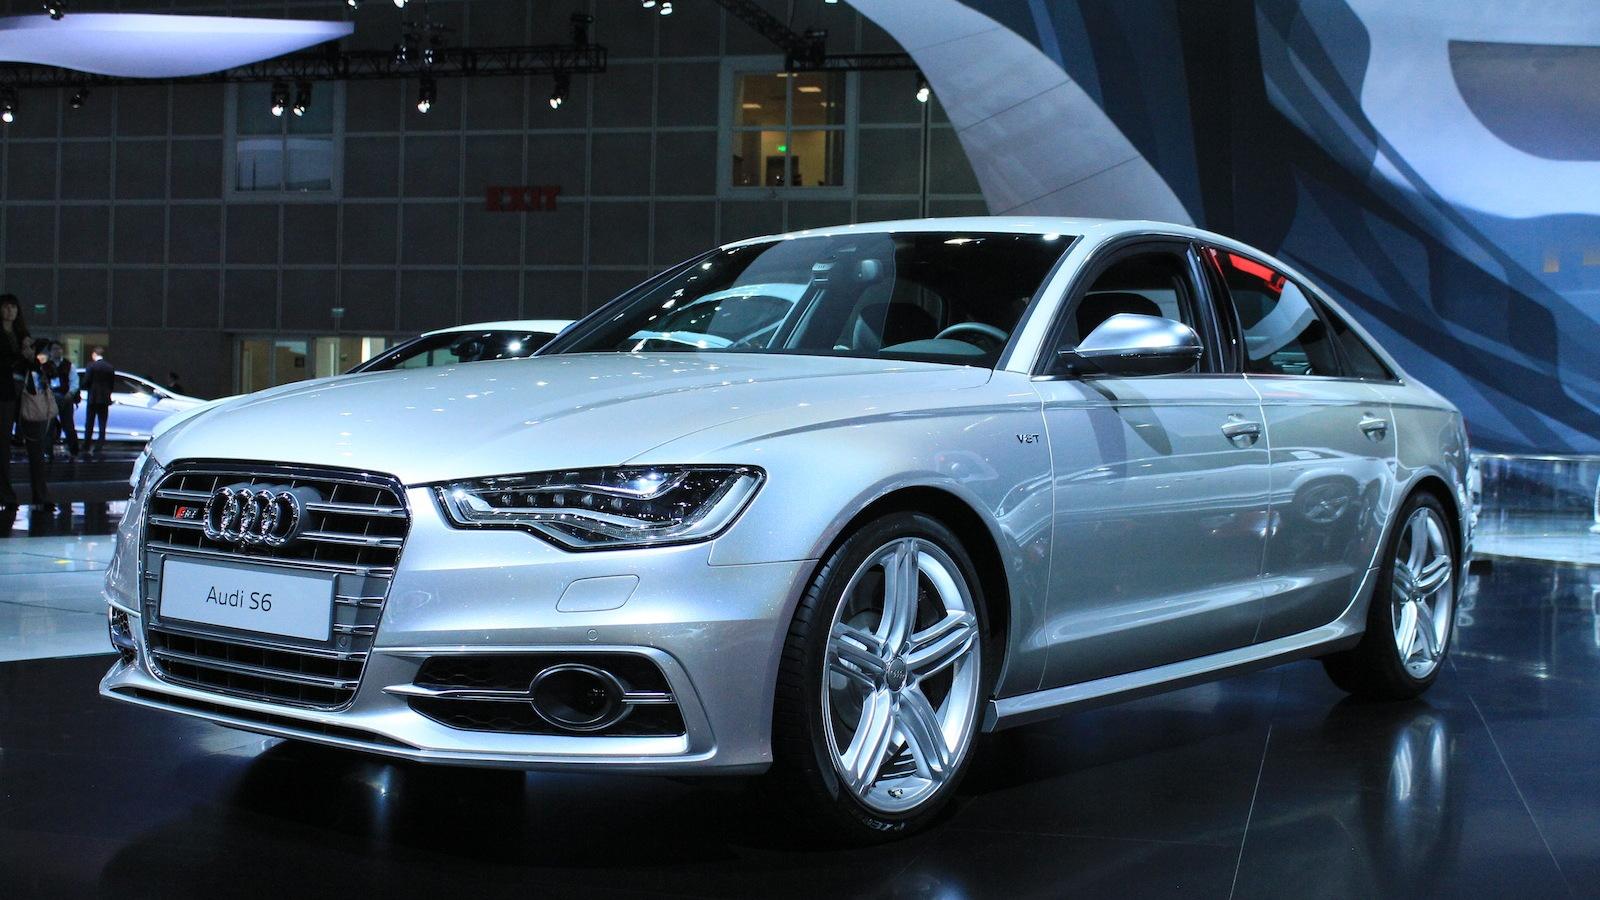 2012 Audi S6 live photos